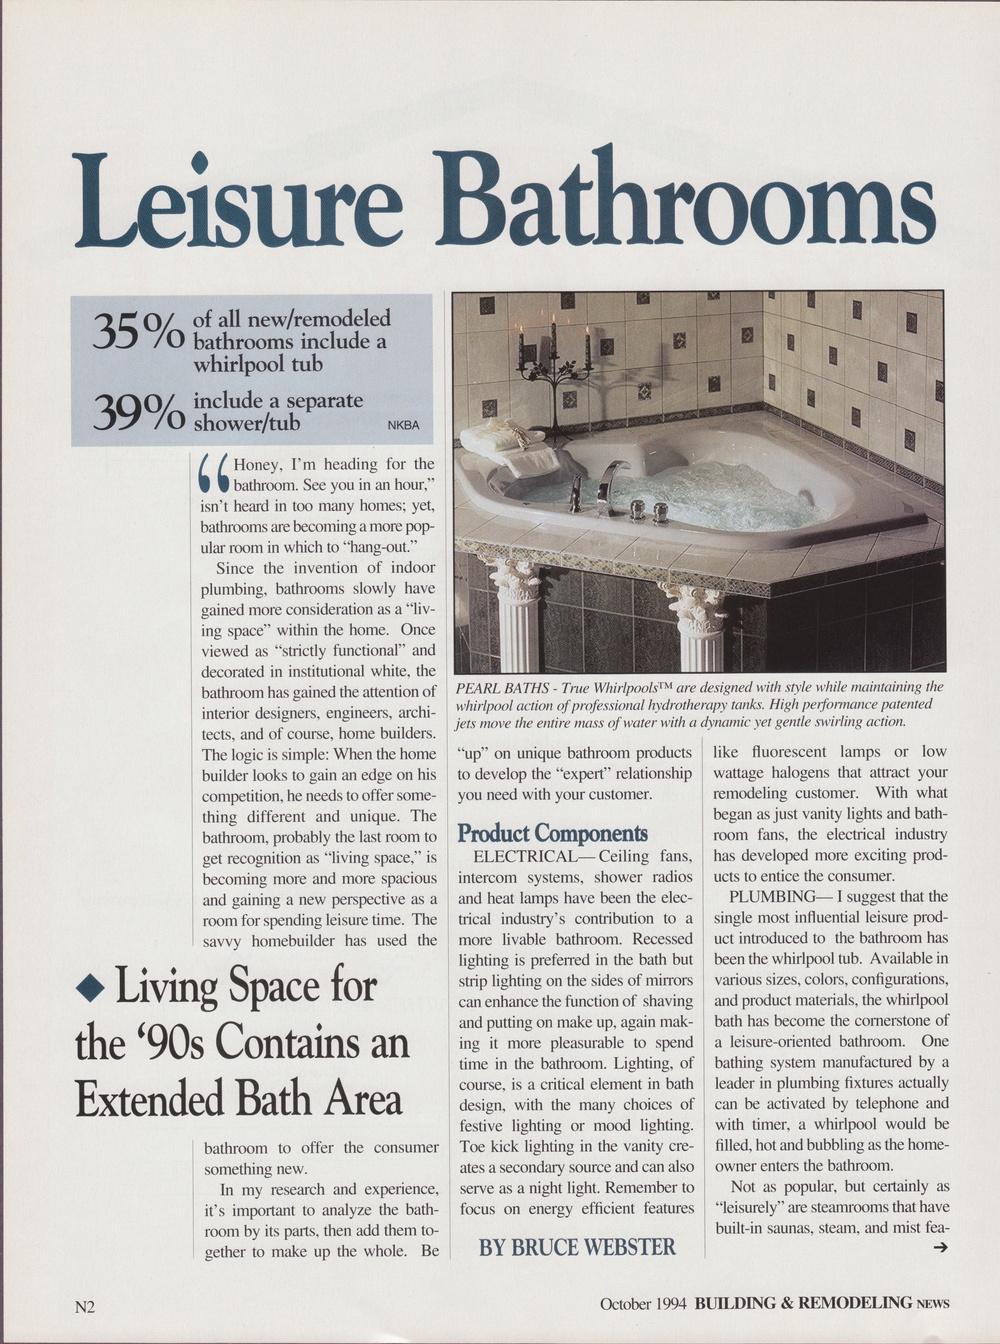 Remodeling_News_bath1994b.jpg